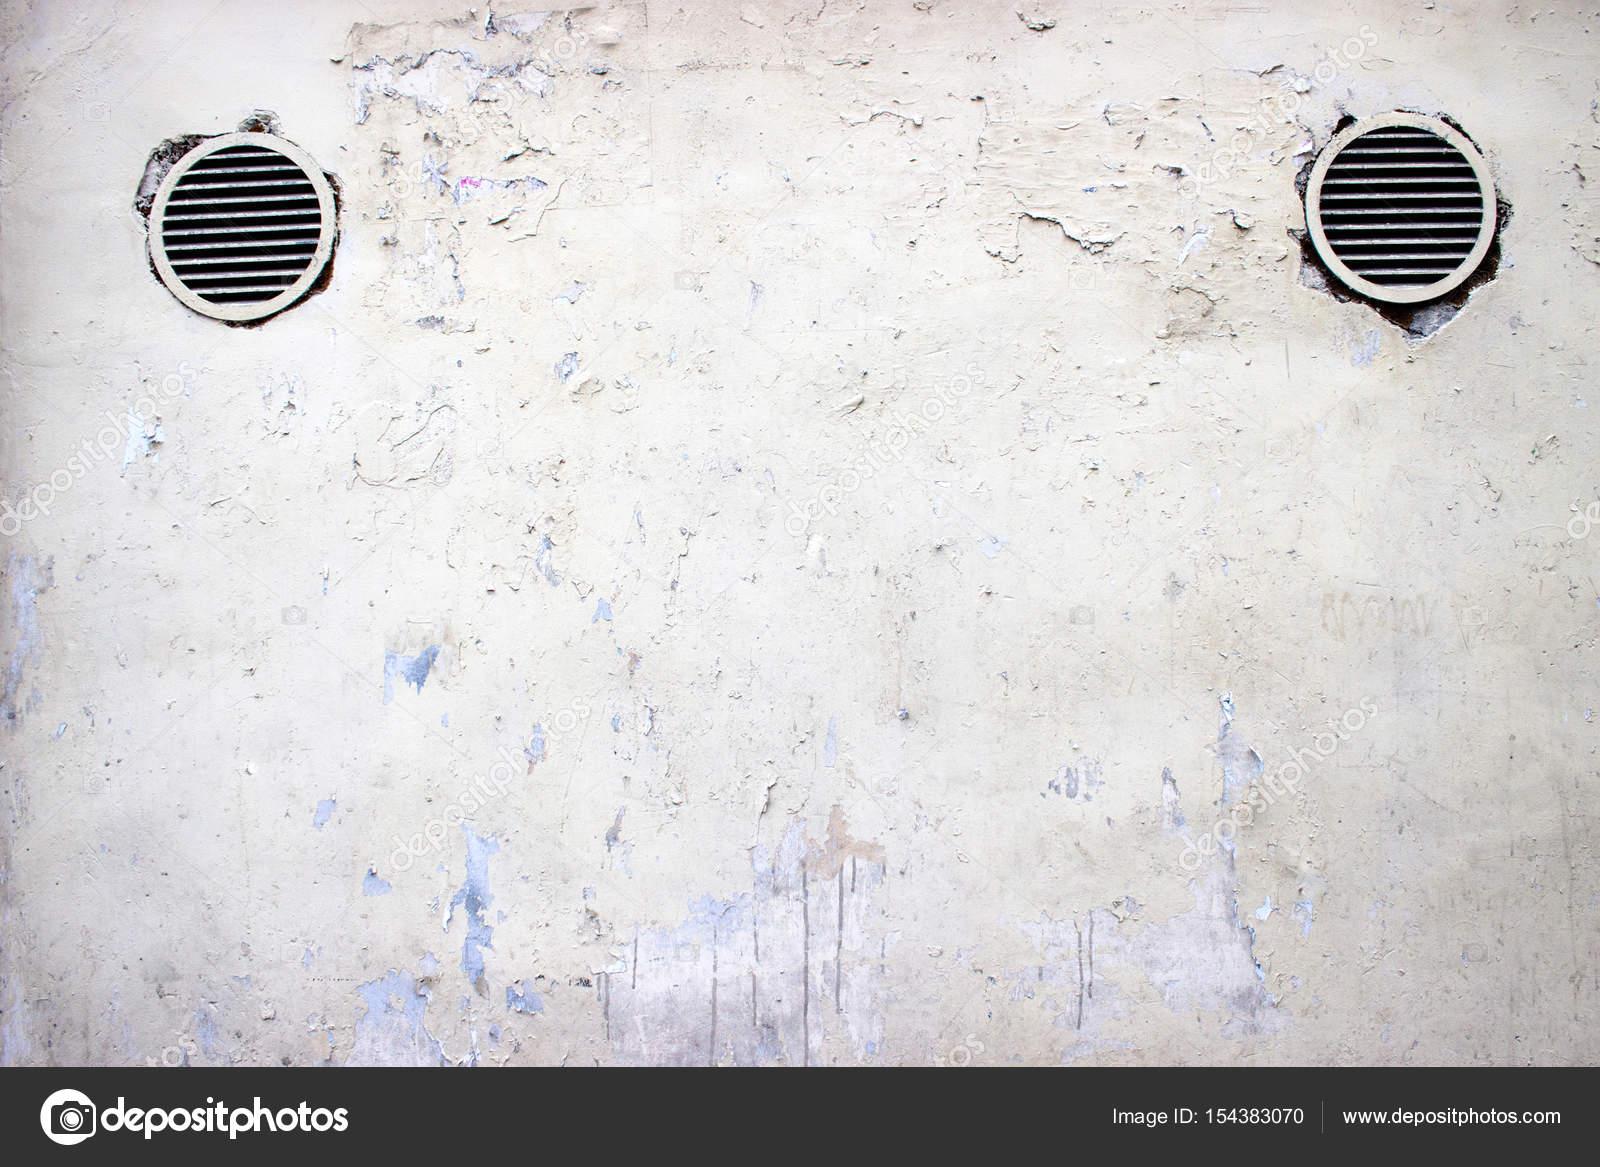 Interno muro urbano bianco texture leggera come sfondo u foto